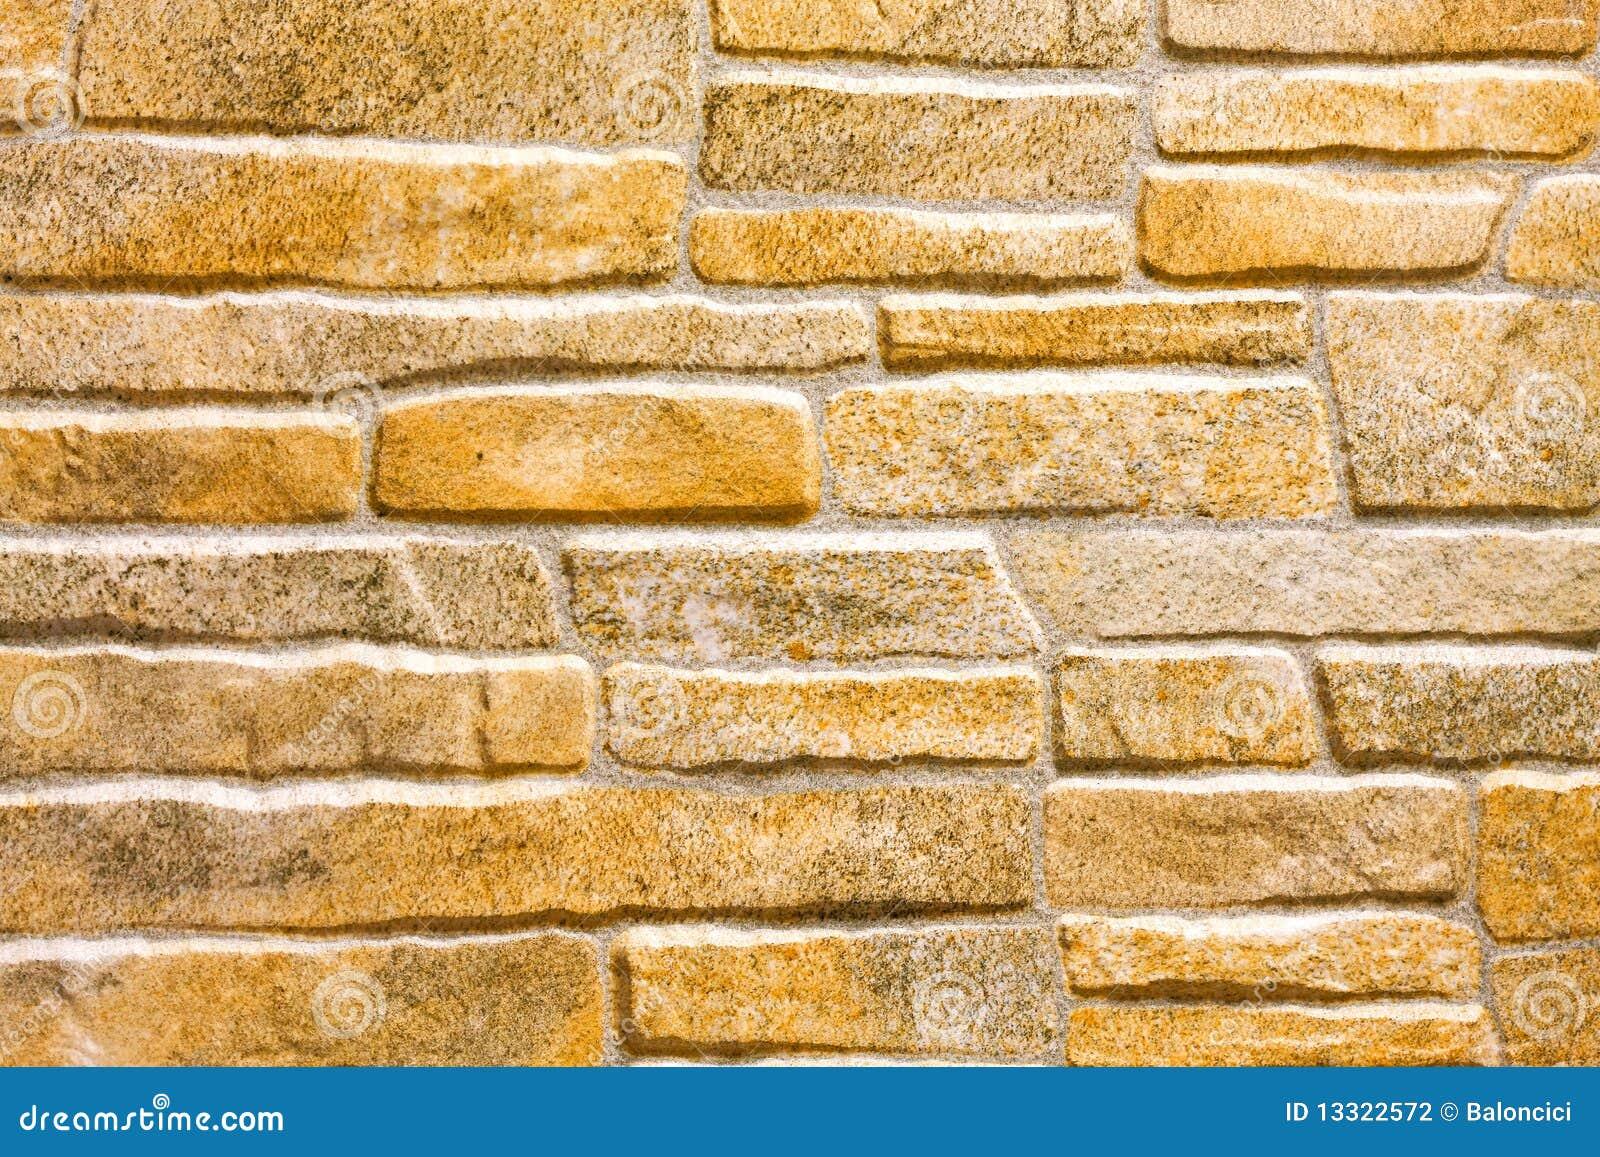 Brick tiles stock photo. Image of tiles, decor, decorative - 13322572